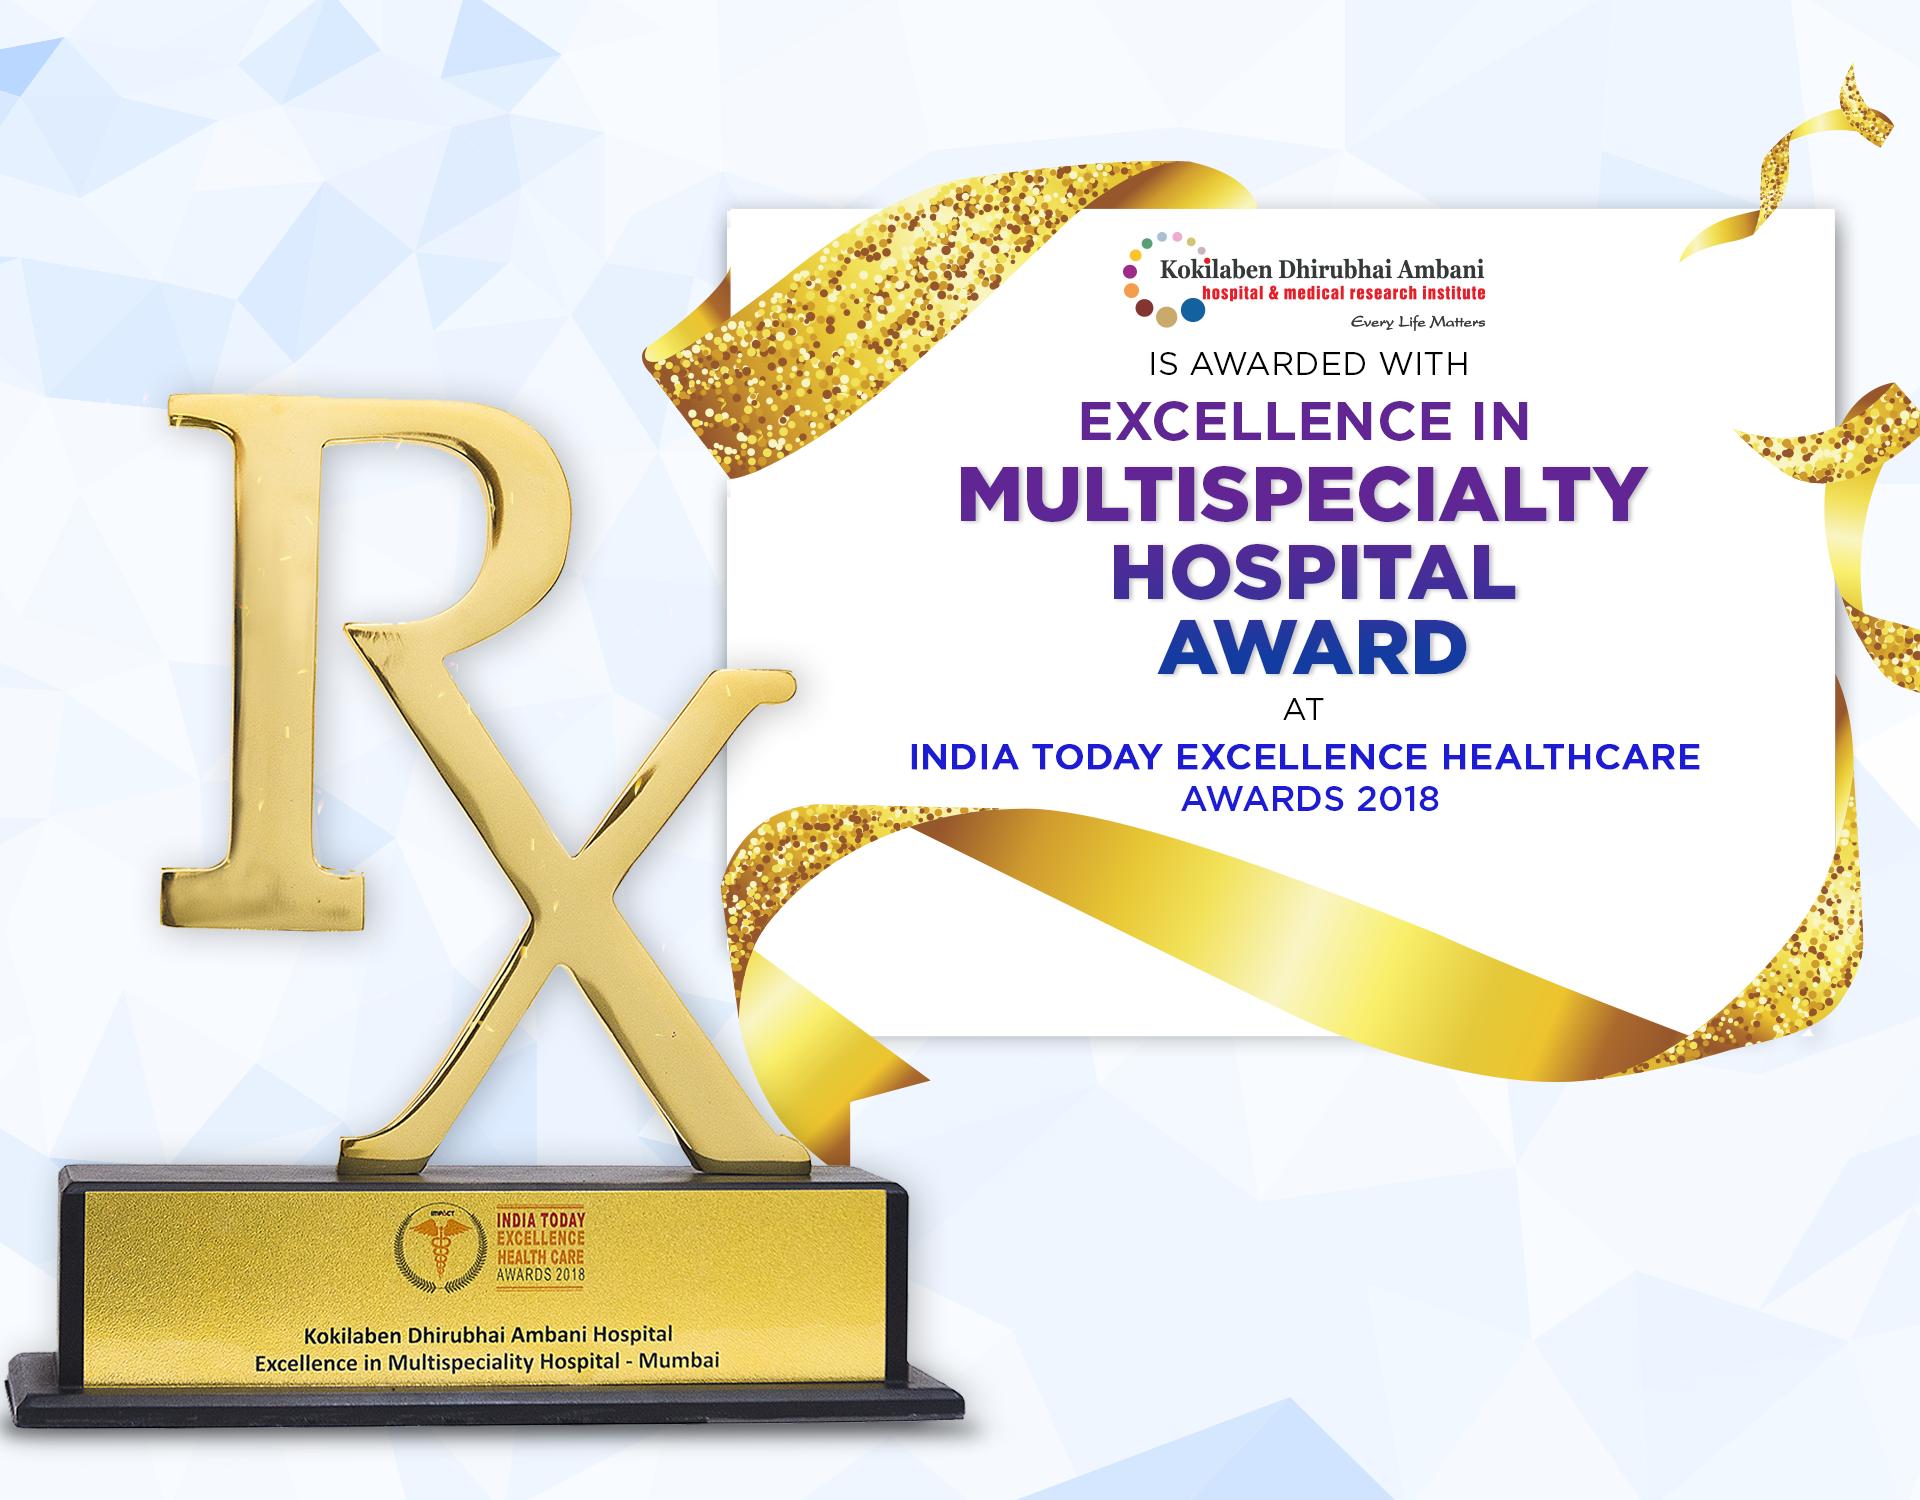 Kokilaben Dhirubhai Ambani Hospital - Excellence In Multispecialty Hospital Award